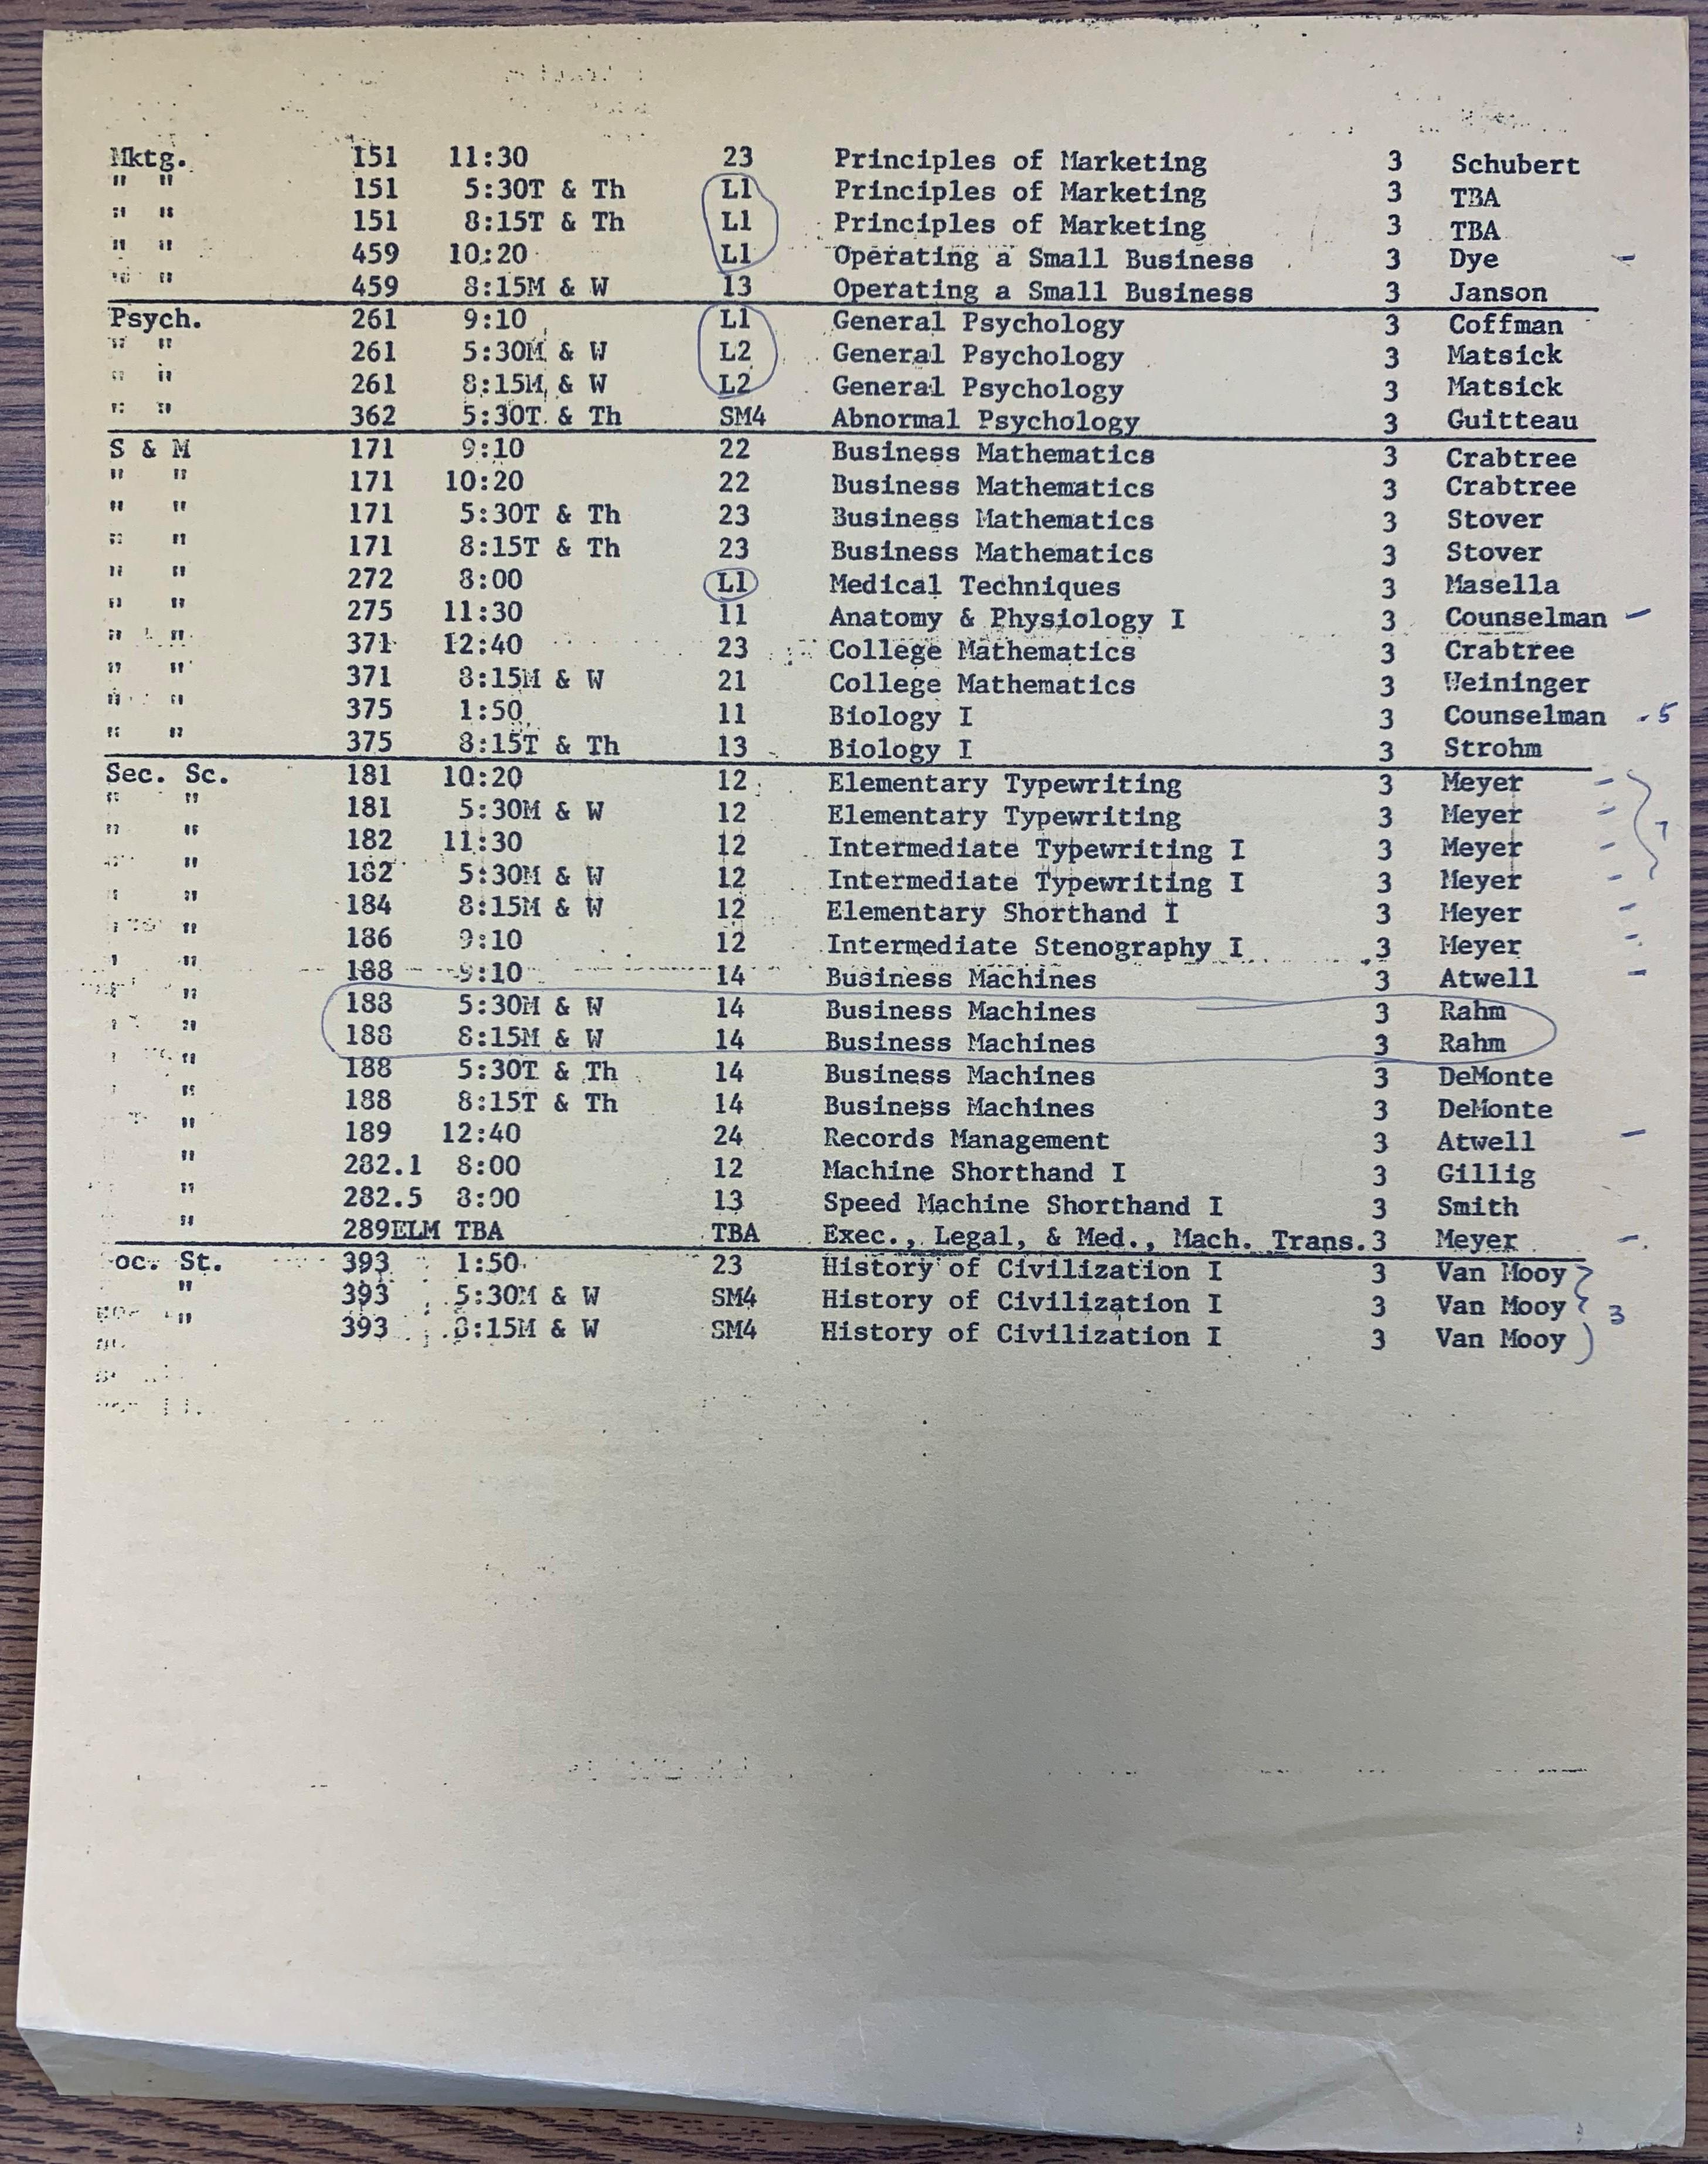 class schedule pg 2